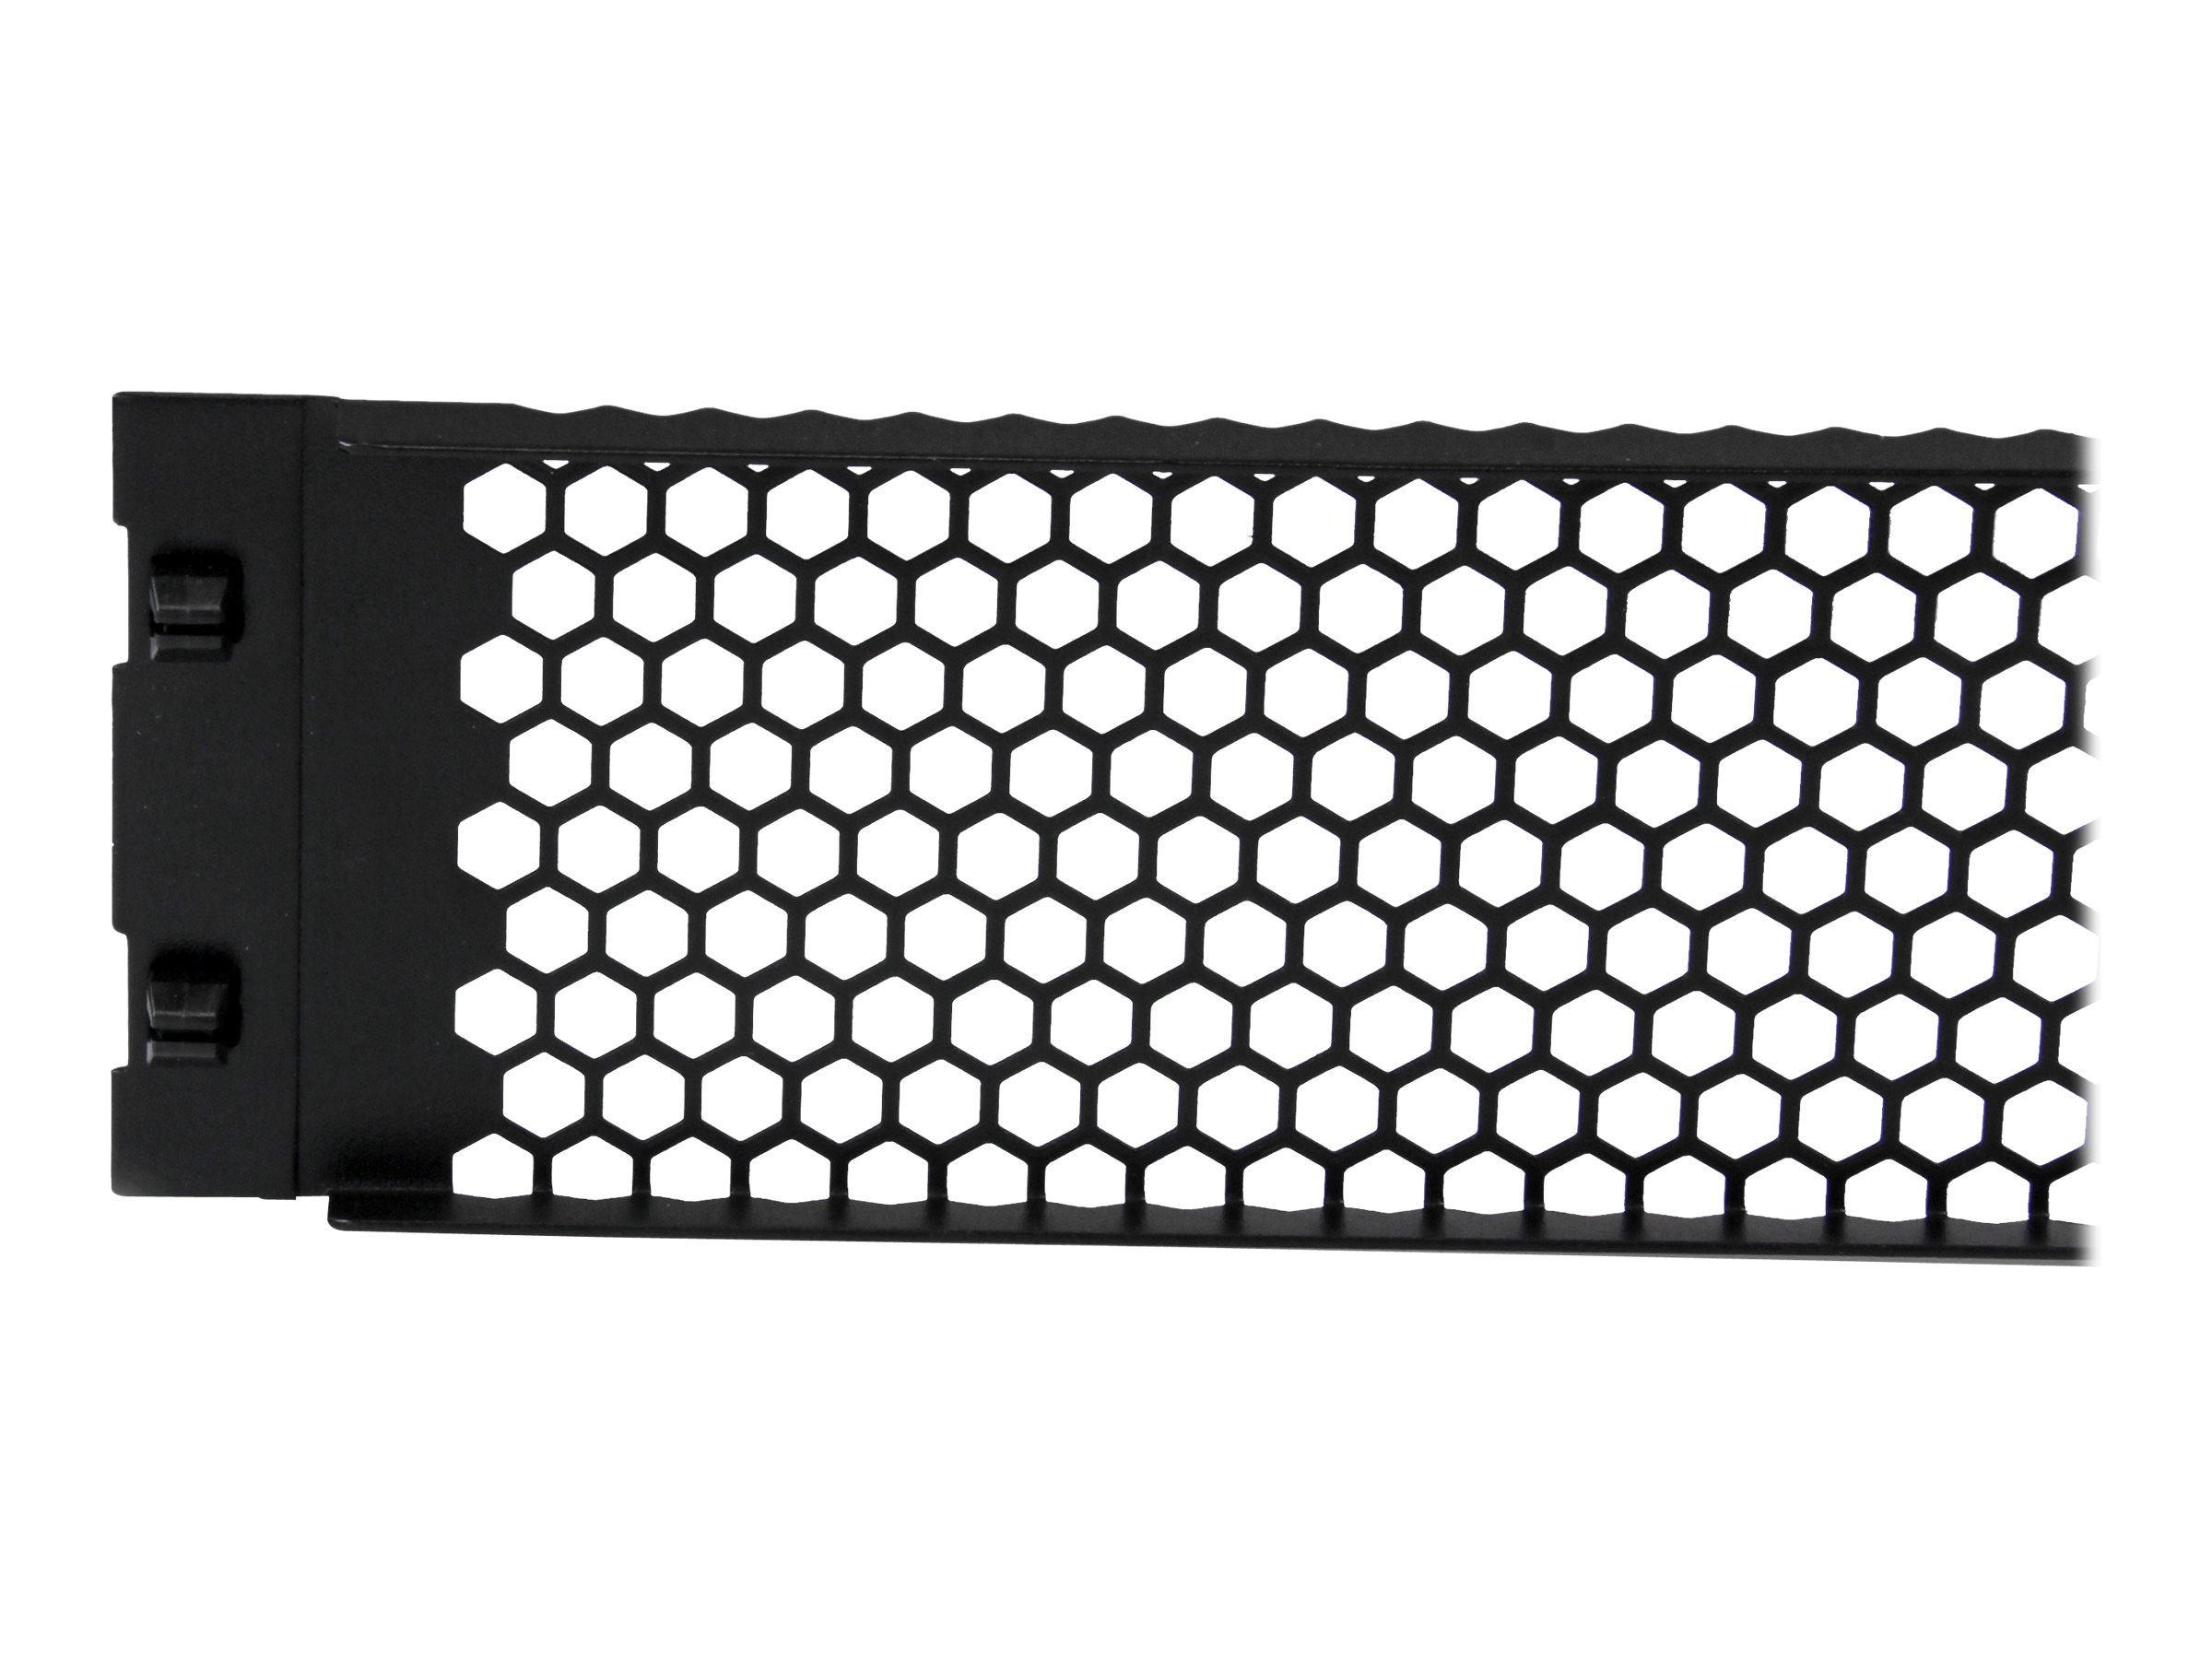 StarTech.com 2U Tool-Less Vented Blank Rack Panel blank panel - 2U